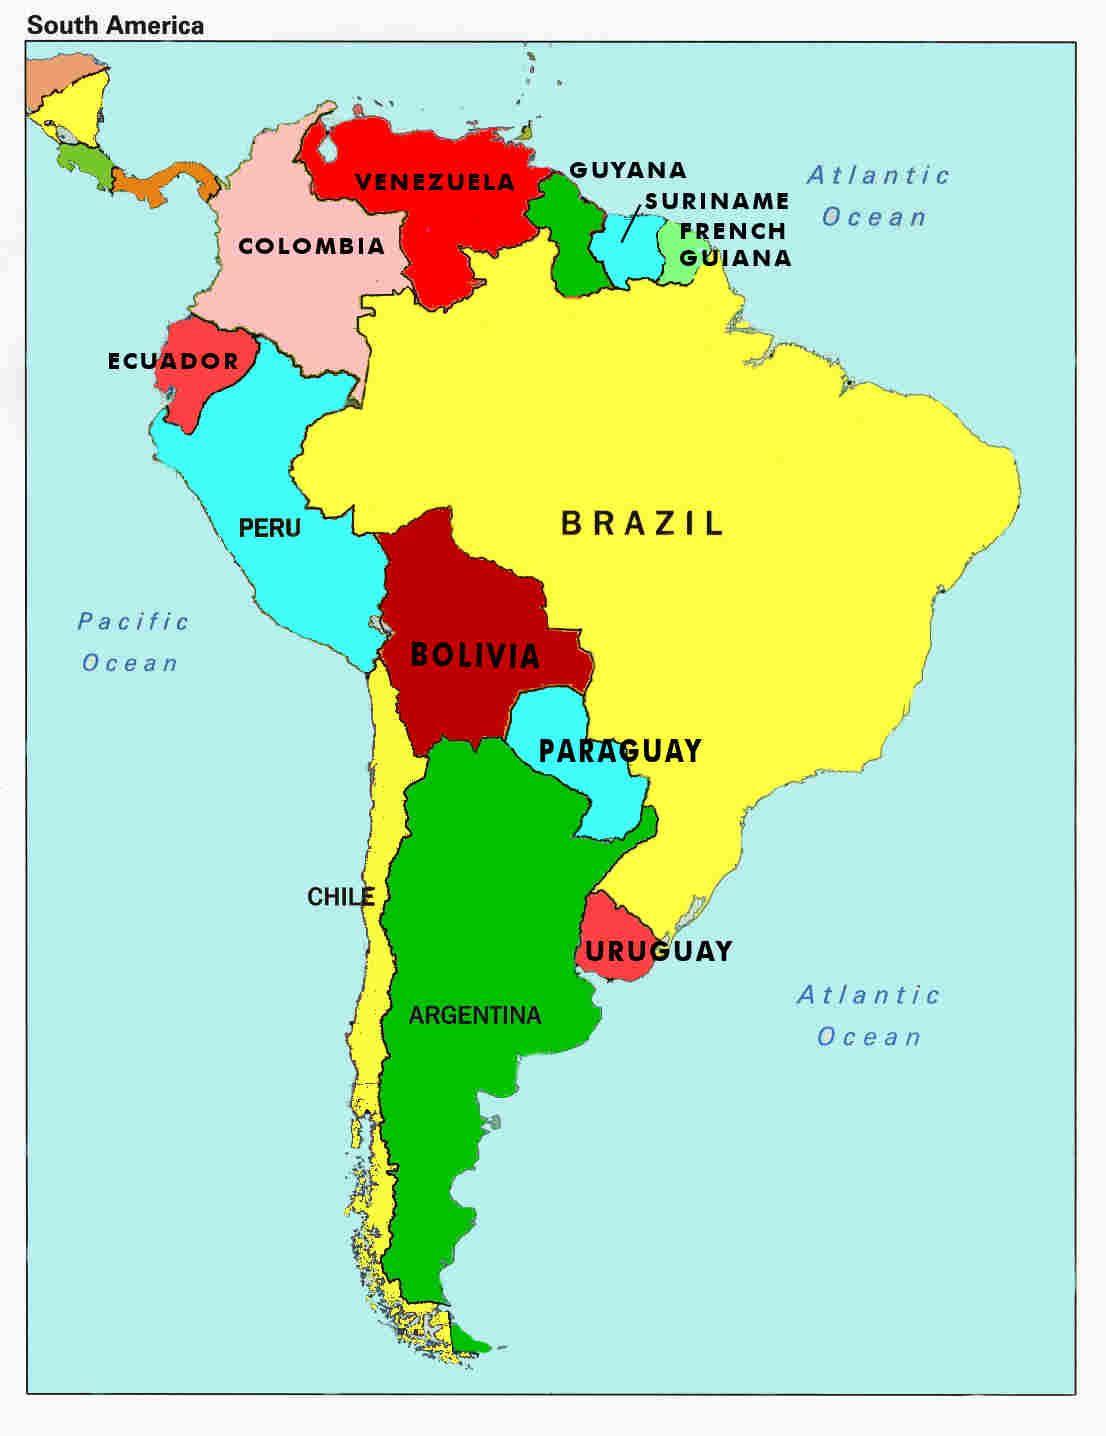 south america map.jpg